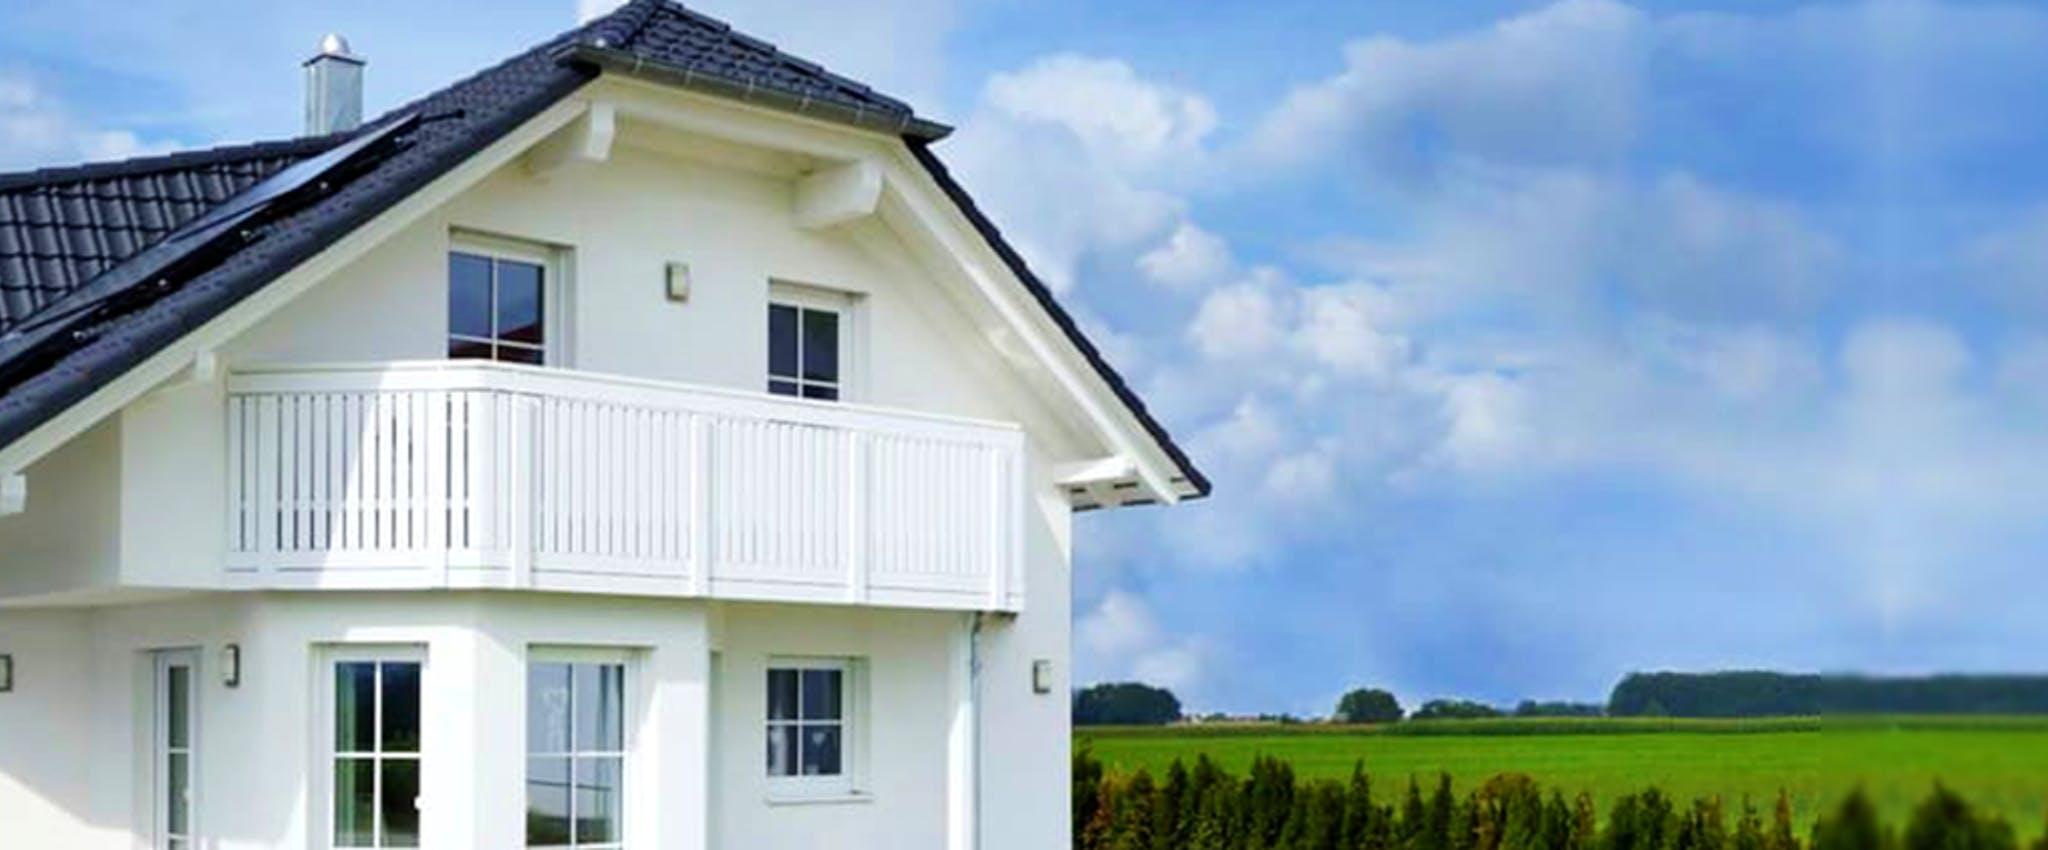 Bausatzhaus Fertighaus bis 50.000 Euro | Fertighaus.de